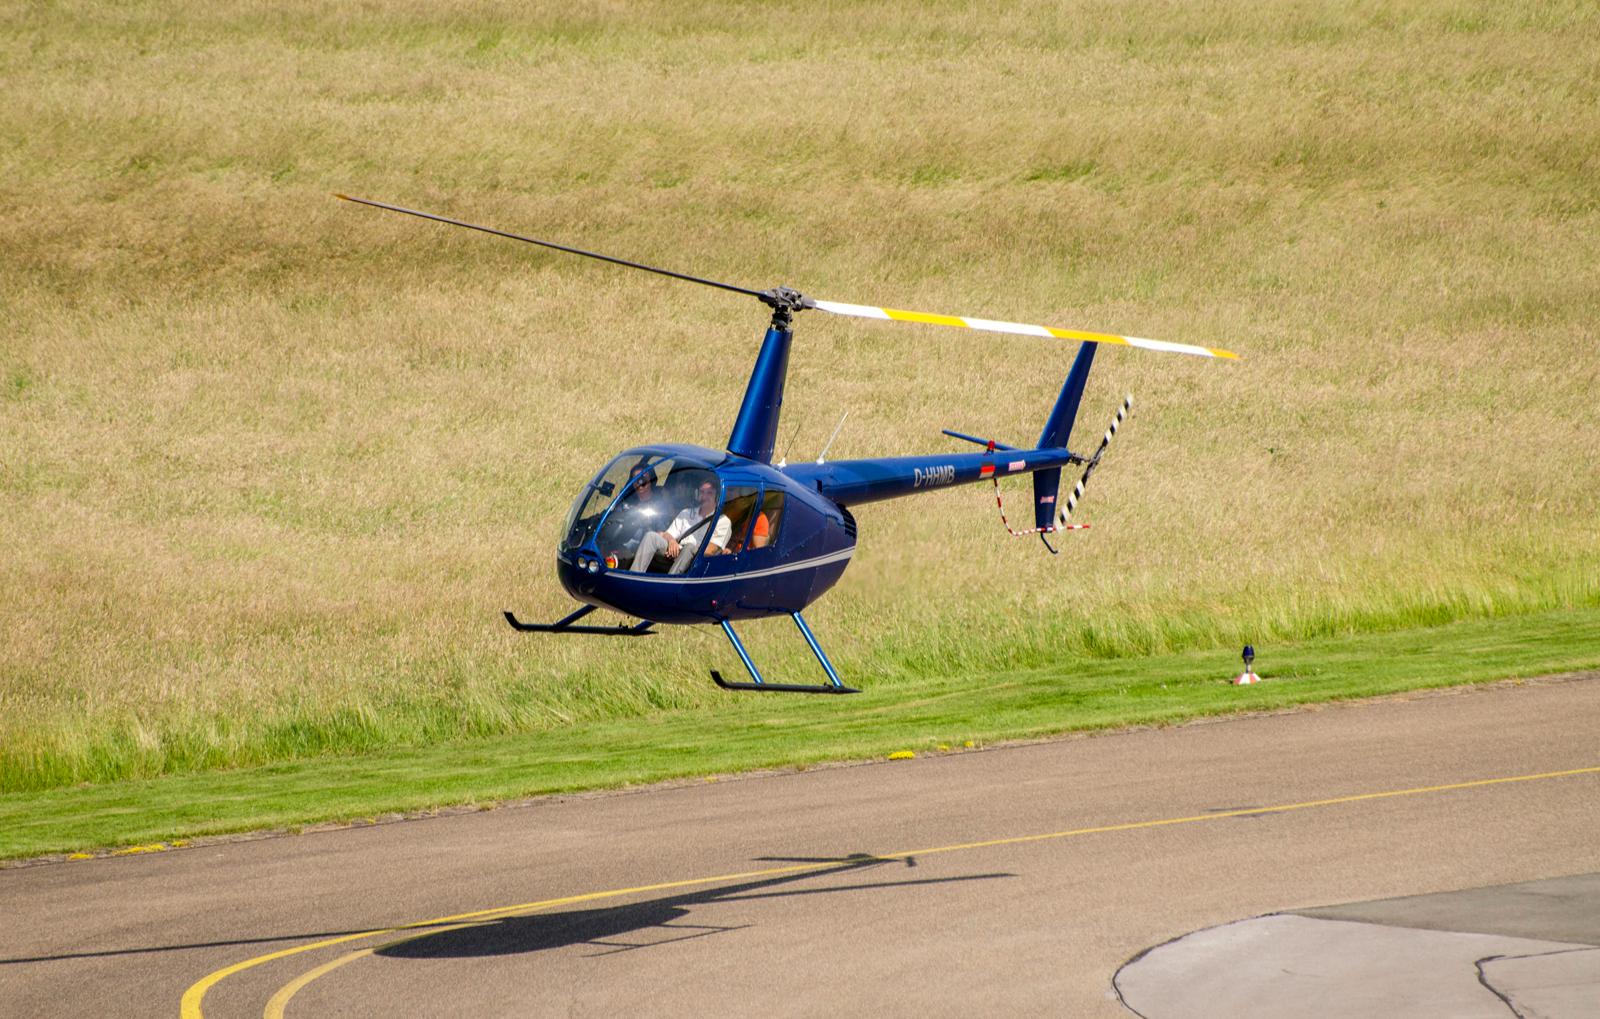 hubschrauber-fliegen-grosspoesna-bg2